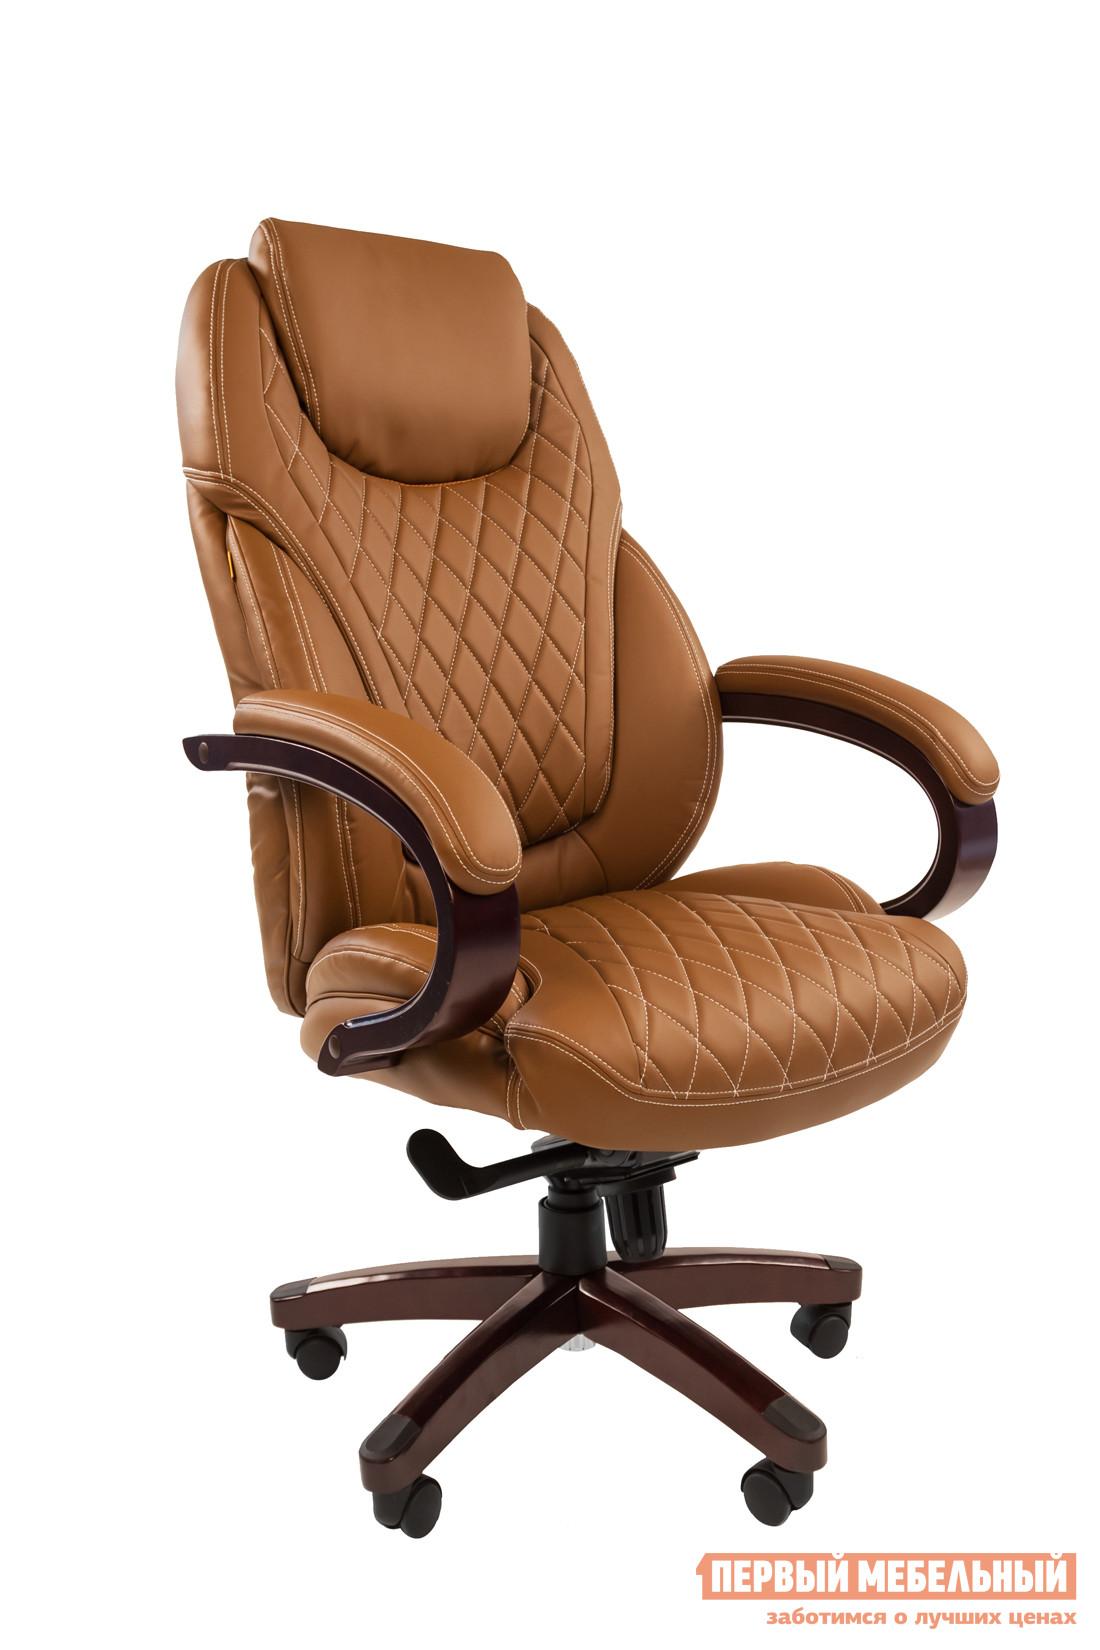 Кресло руководителя Тайпит CH 406 406